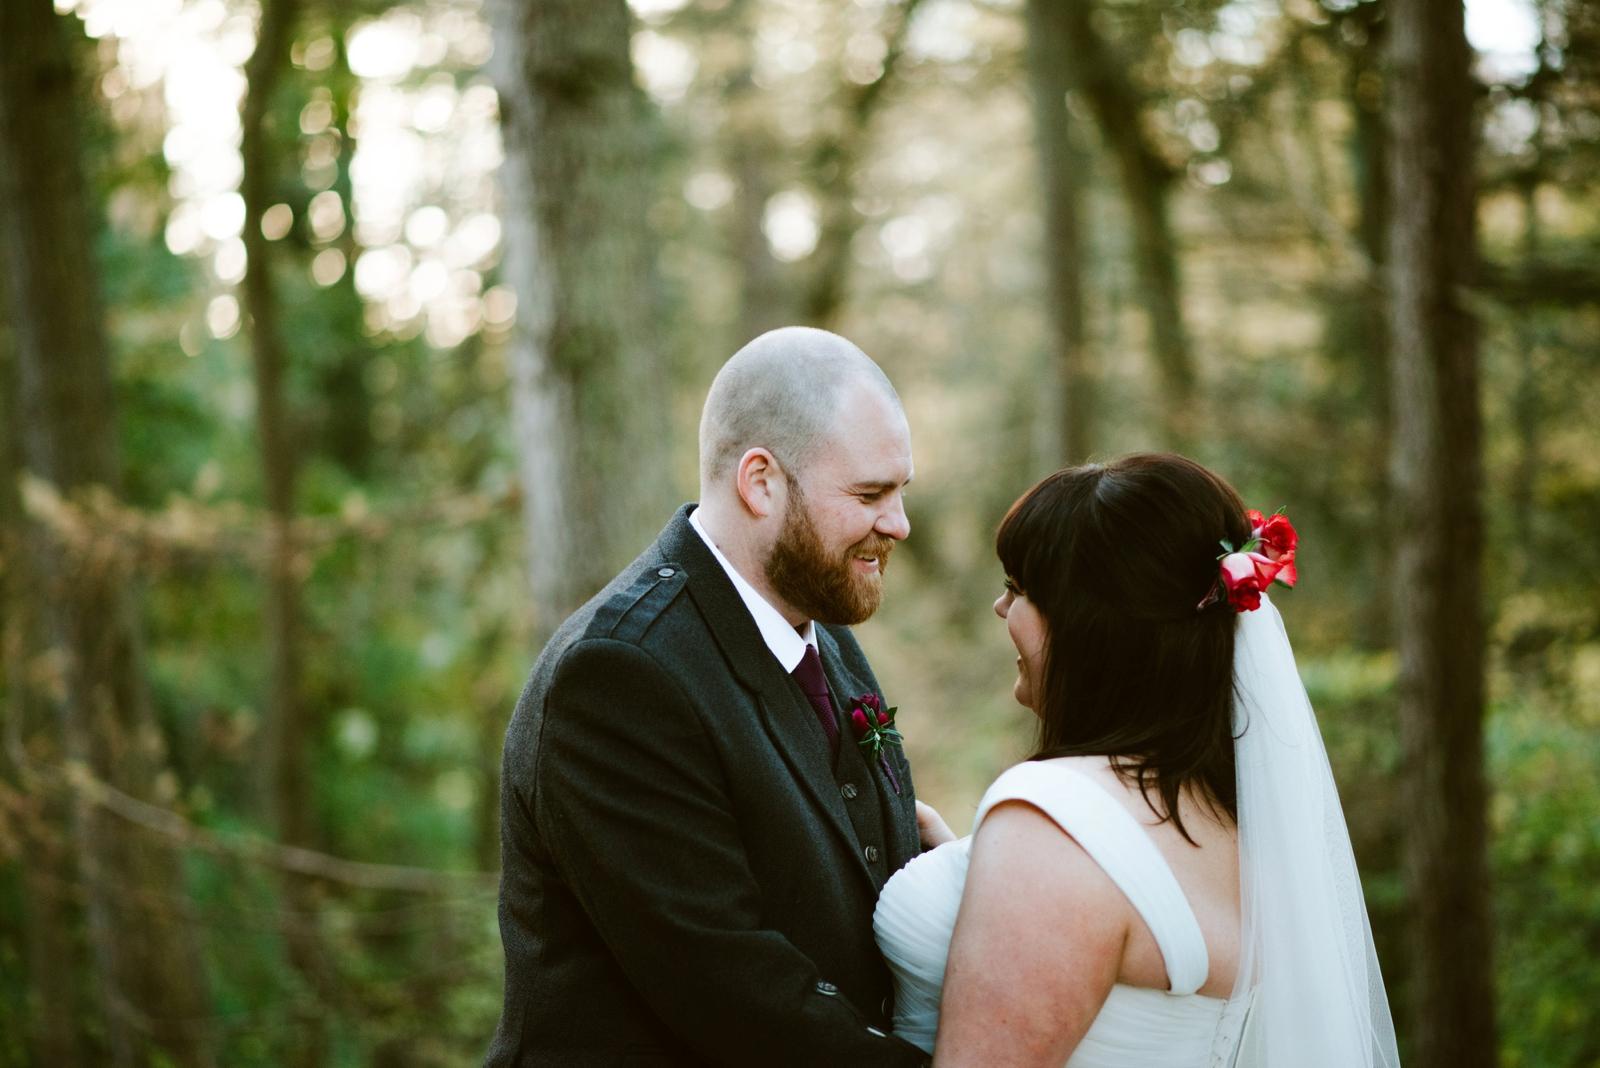 alternative-wedding-photography-scotland-katie-stephen-aikwood-tower-284.jpg